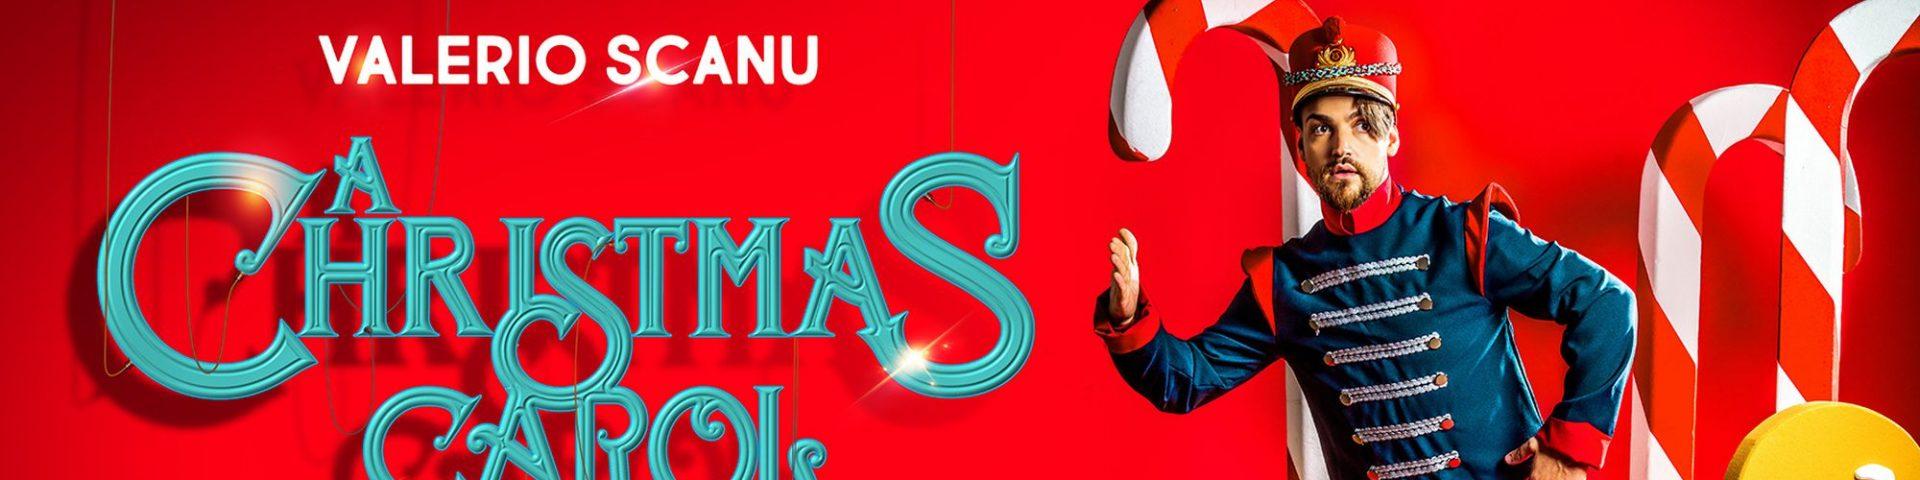 A Christmas Carol di Valerio Scanu a Roma: biglietti, ospiti, come arrivare